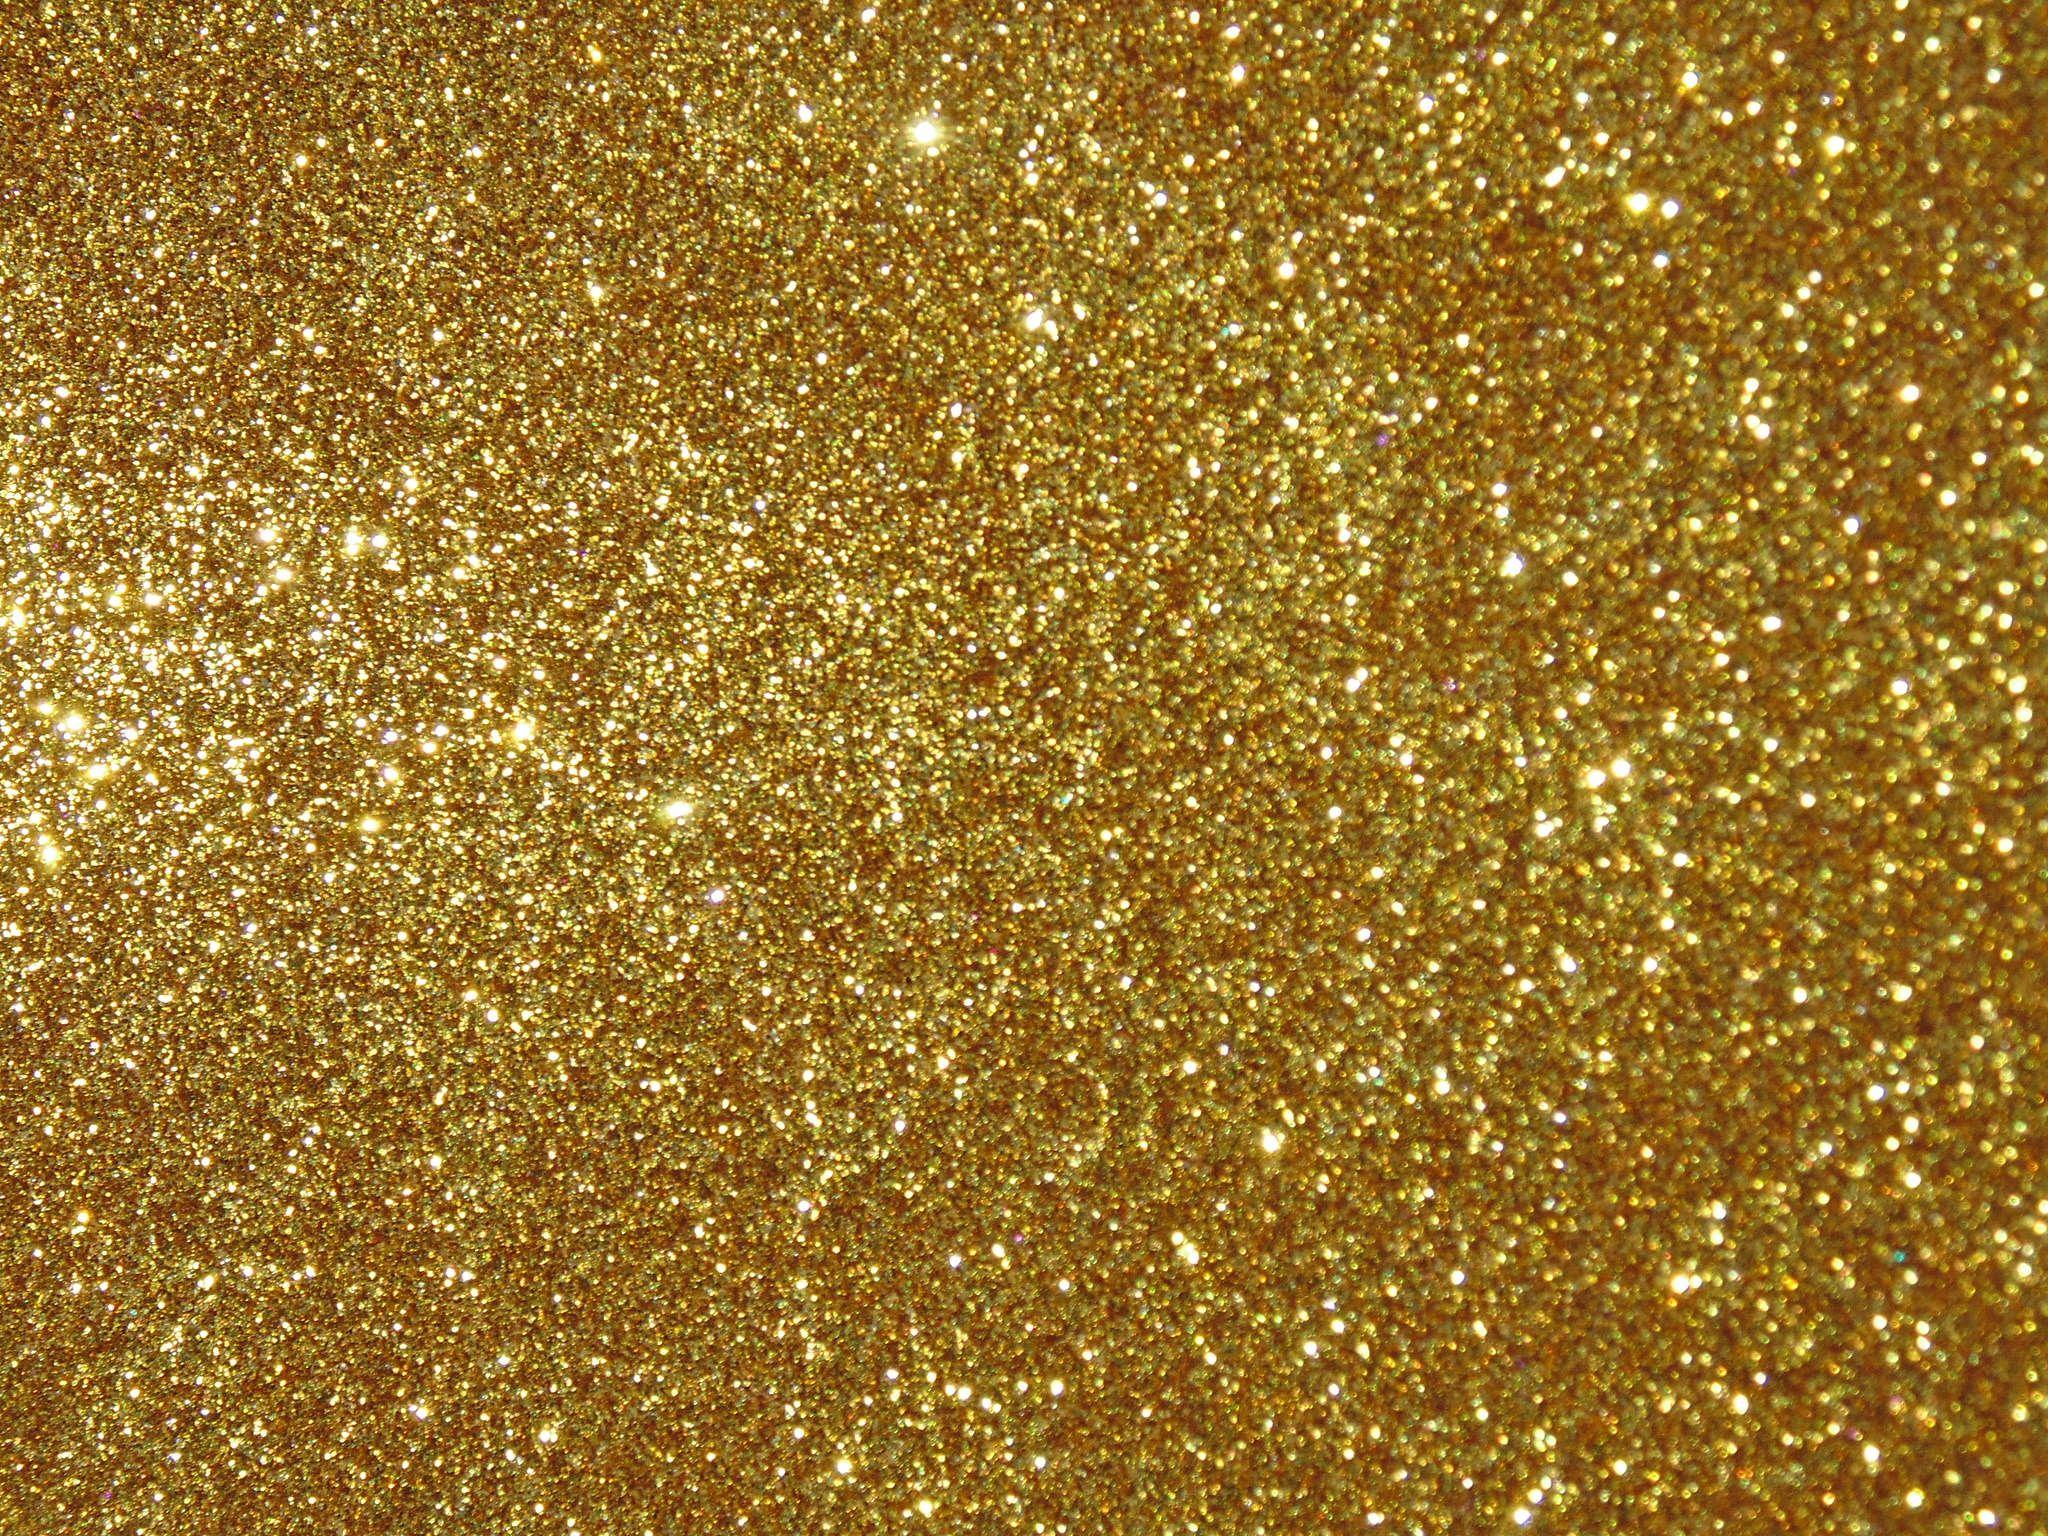 Gold Glitter Wallpaper Hd Hd Wallpapers Backgrounds Images Gold Glitter Wallpaper Hd Gold Glitter Background Sparkle Wallpaper